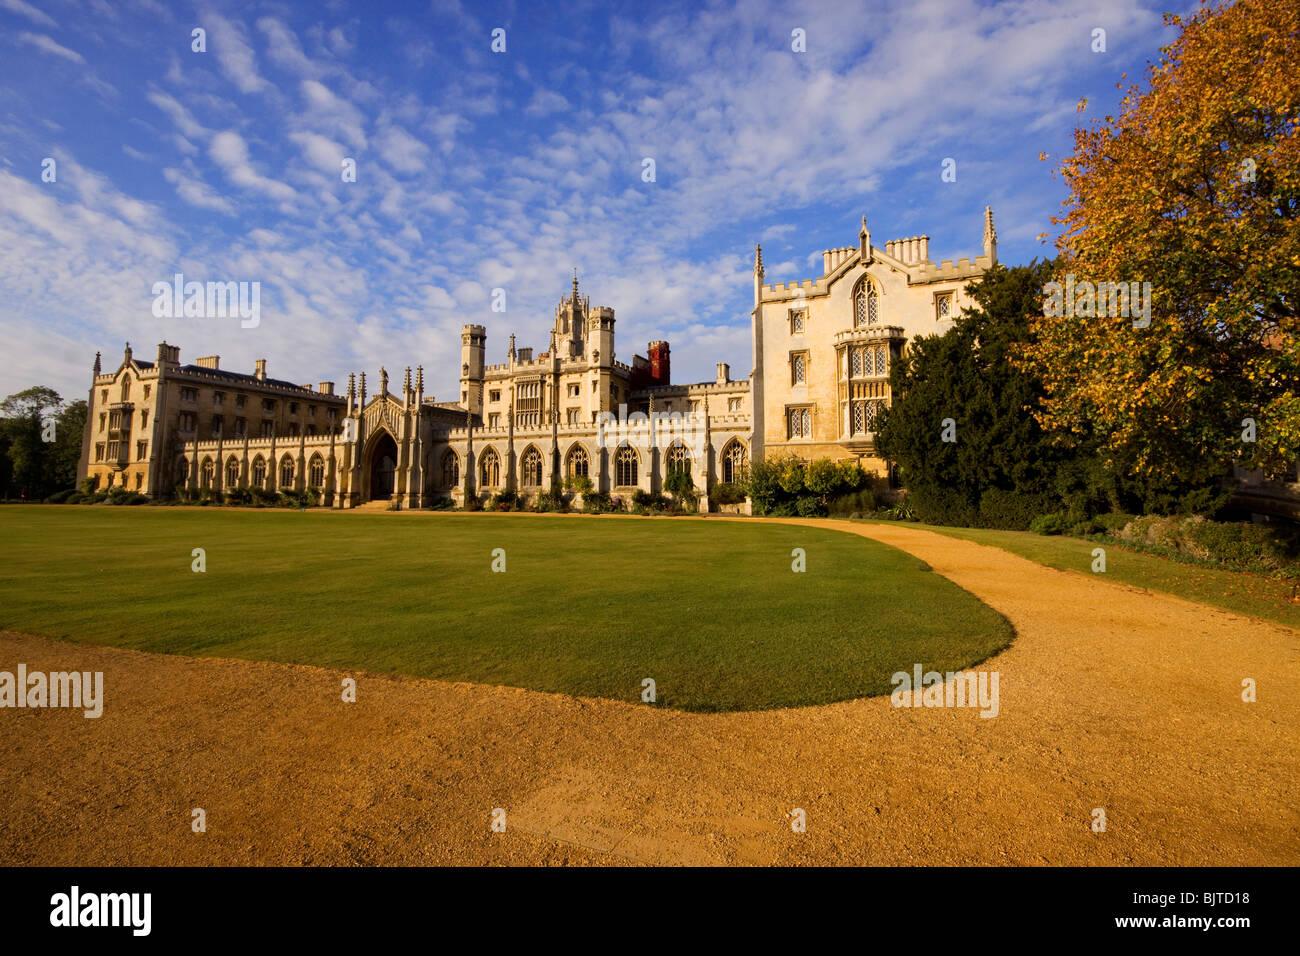 St John's College Cambridge - Stock Image